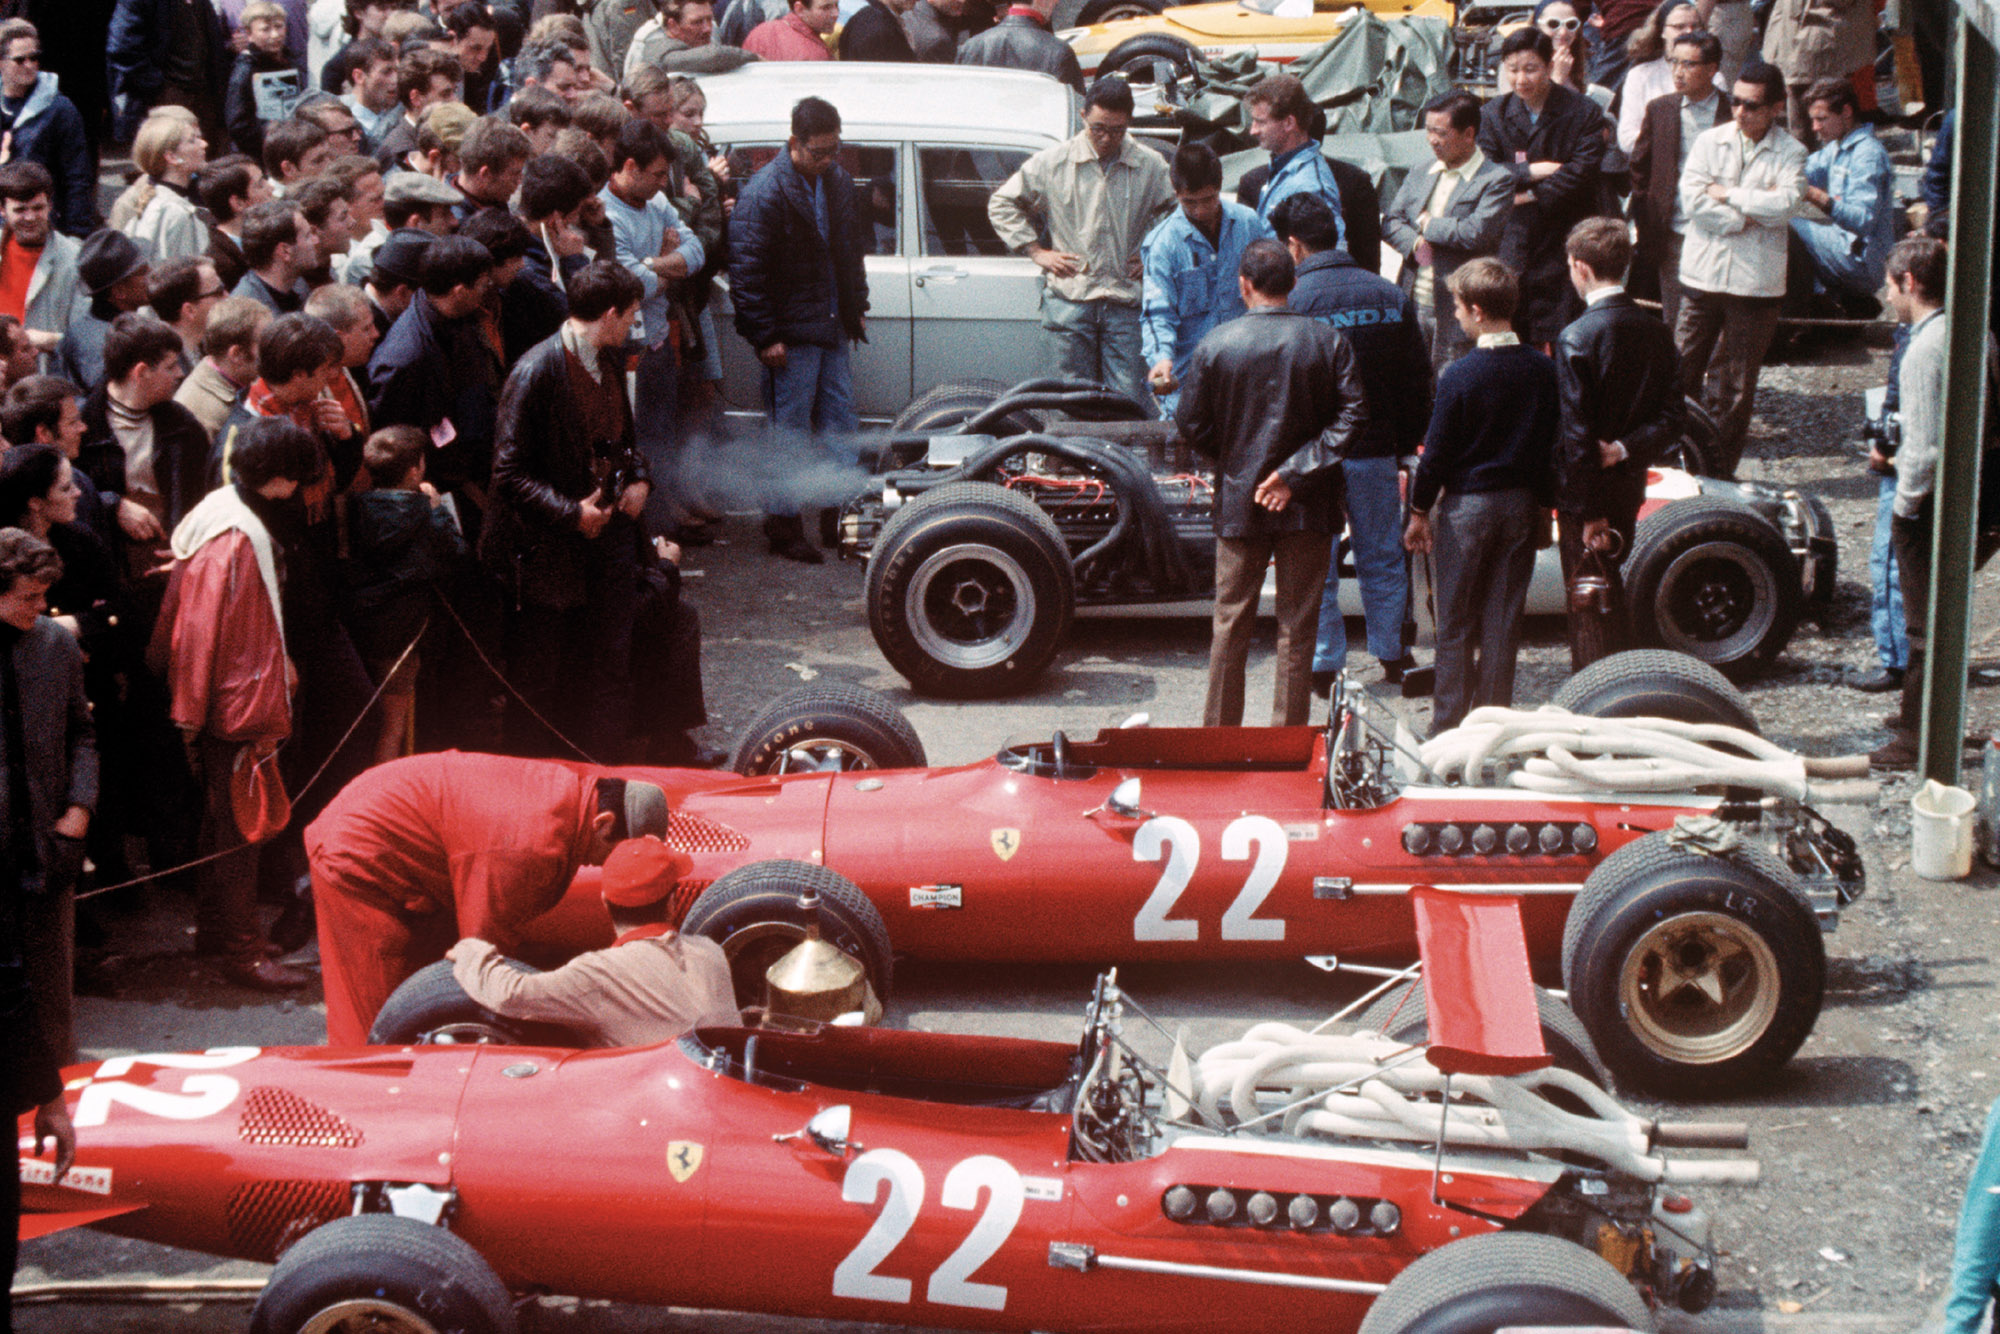 Ferrari Spa 1968